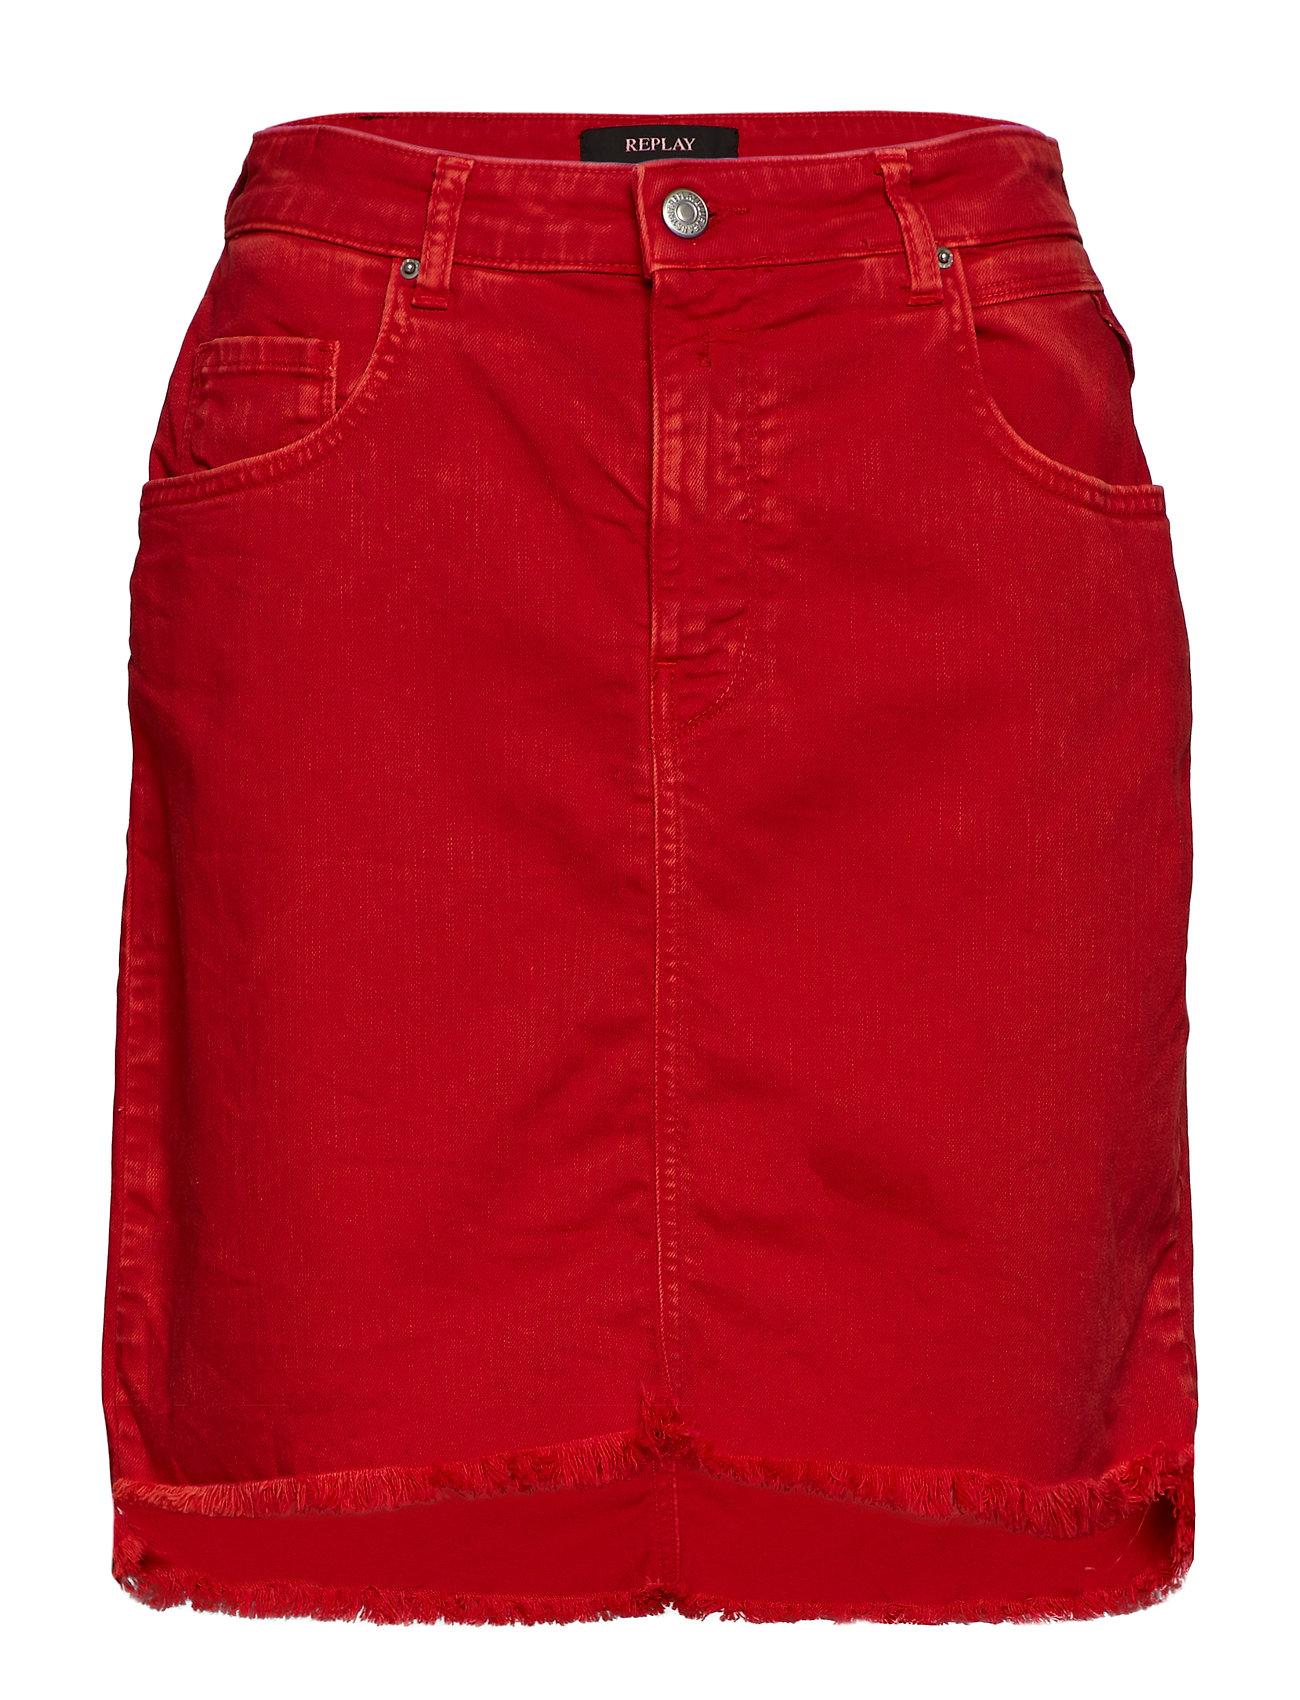 Replay Skirt - BRIGHT RED